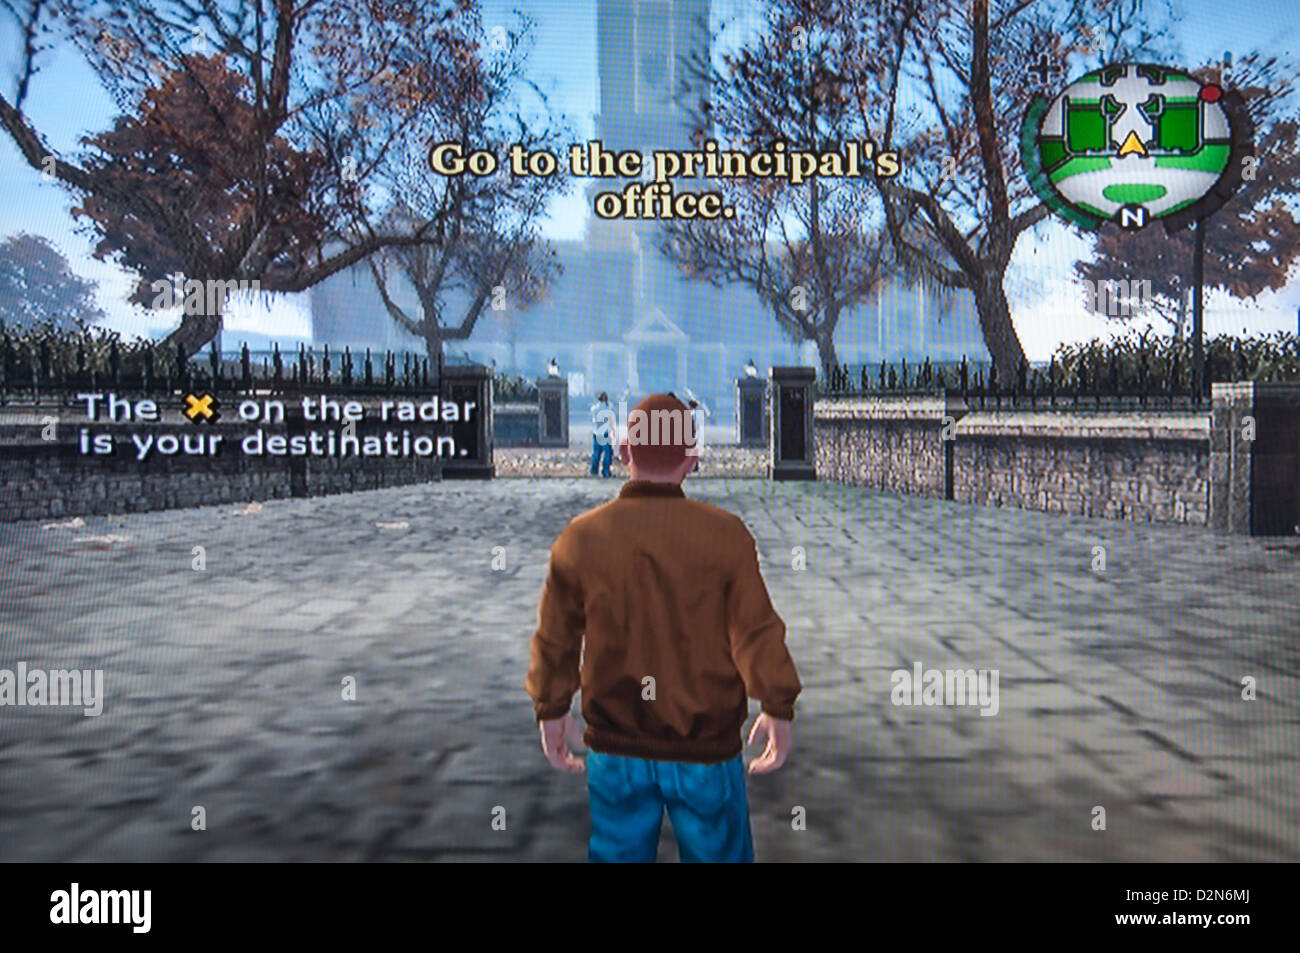 Jeu vidéo Grand Theft Auto Photo Stock